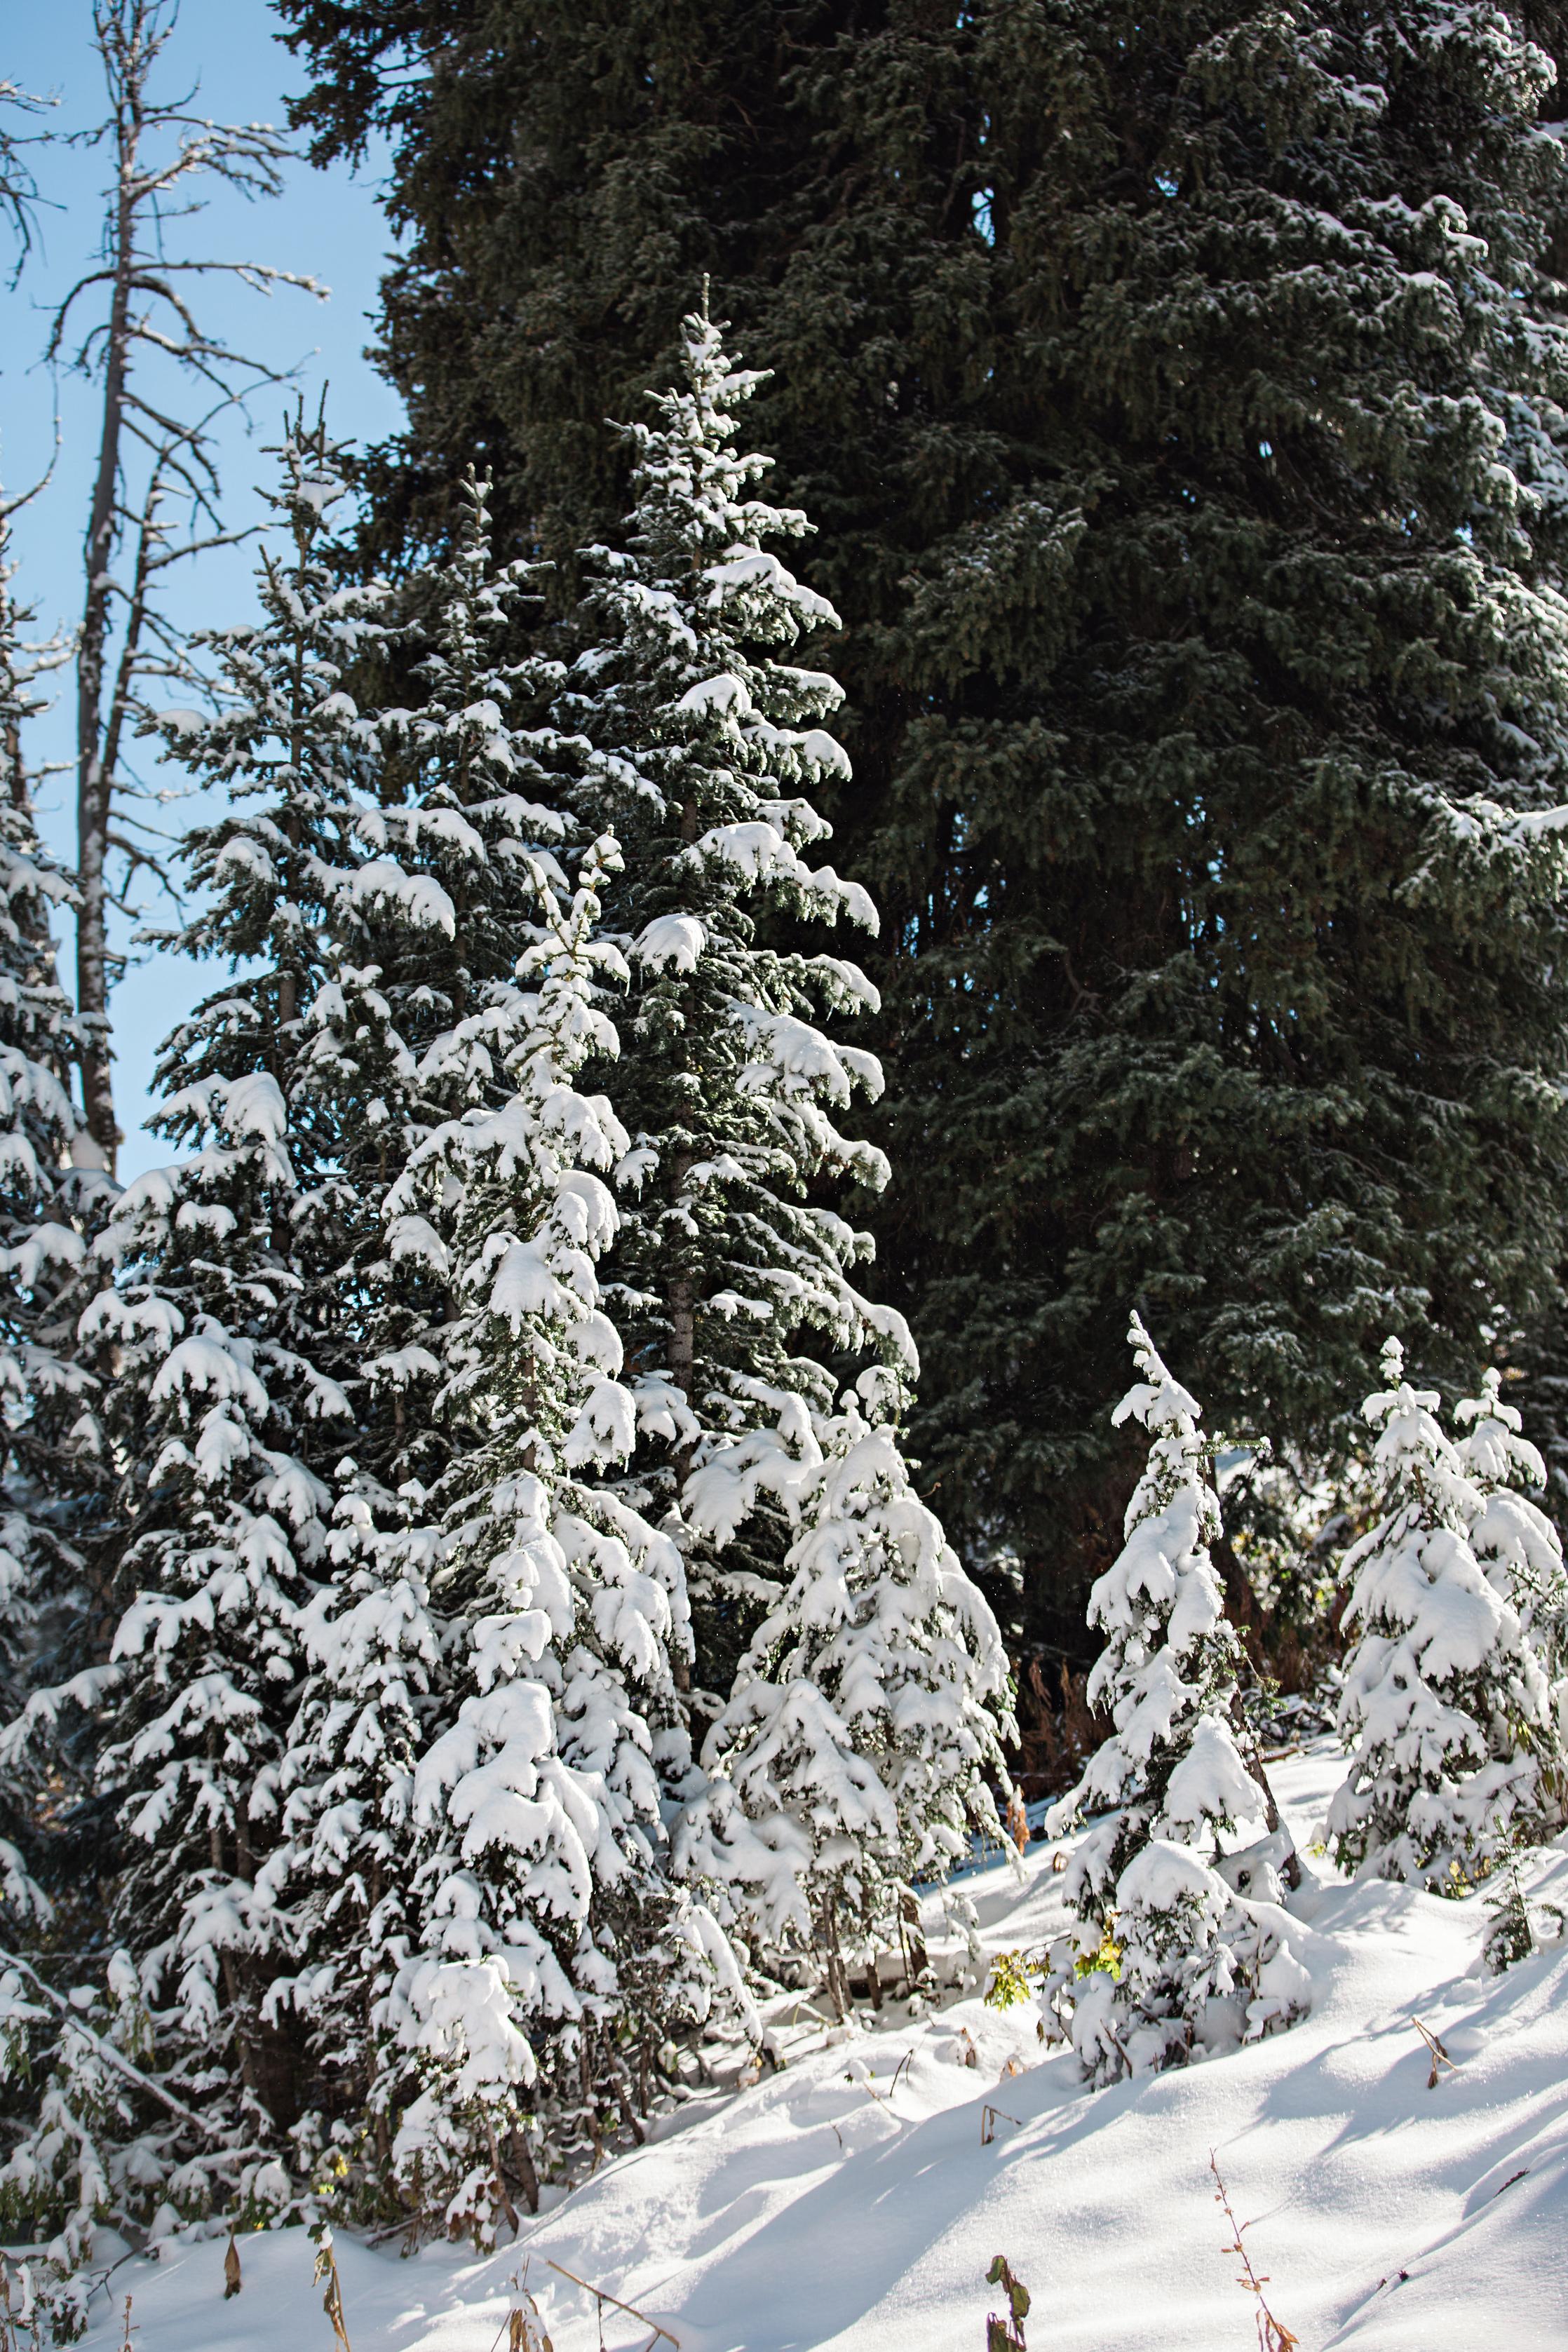 Cindy_Giovagnoli_Idaho_Wyoming_Grand_Teton_National_Park_autumn_aspens_camping_mountains-012.jpg